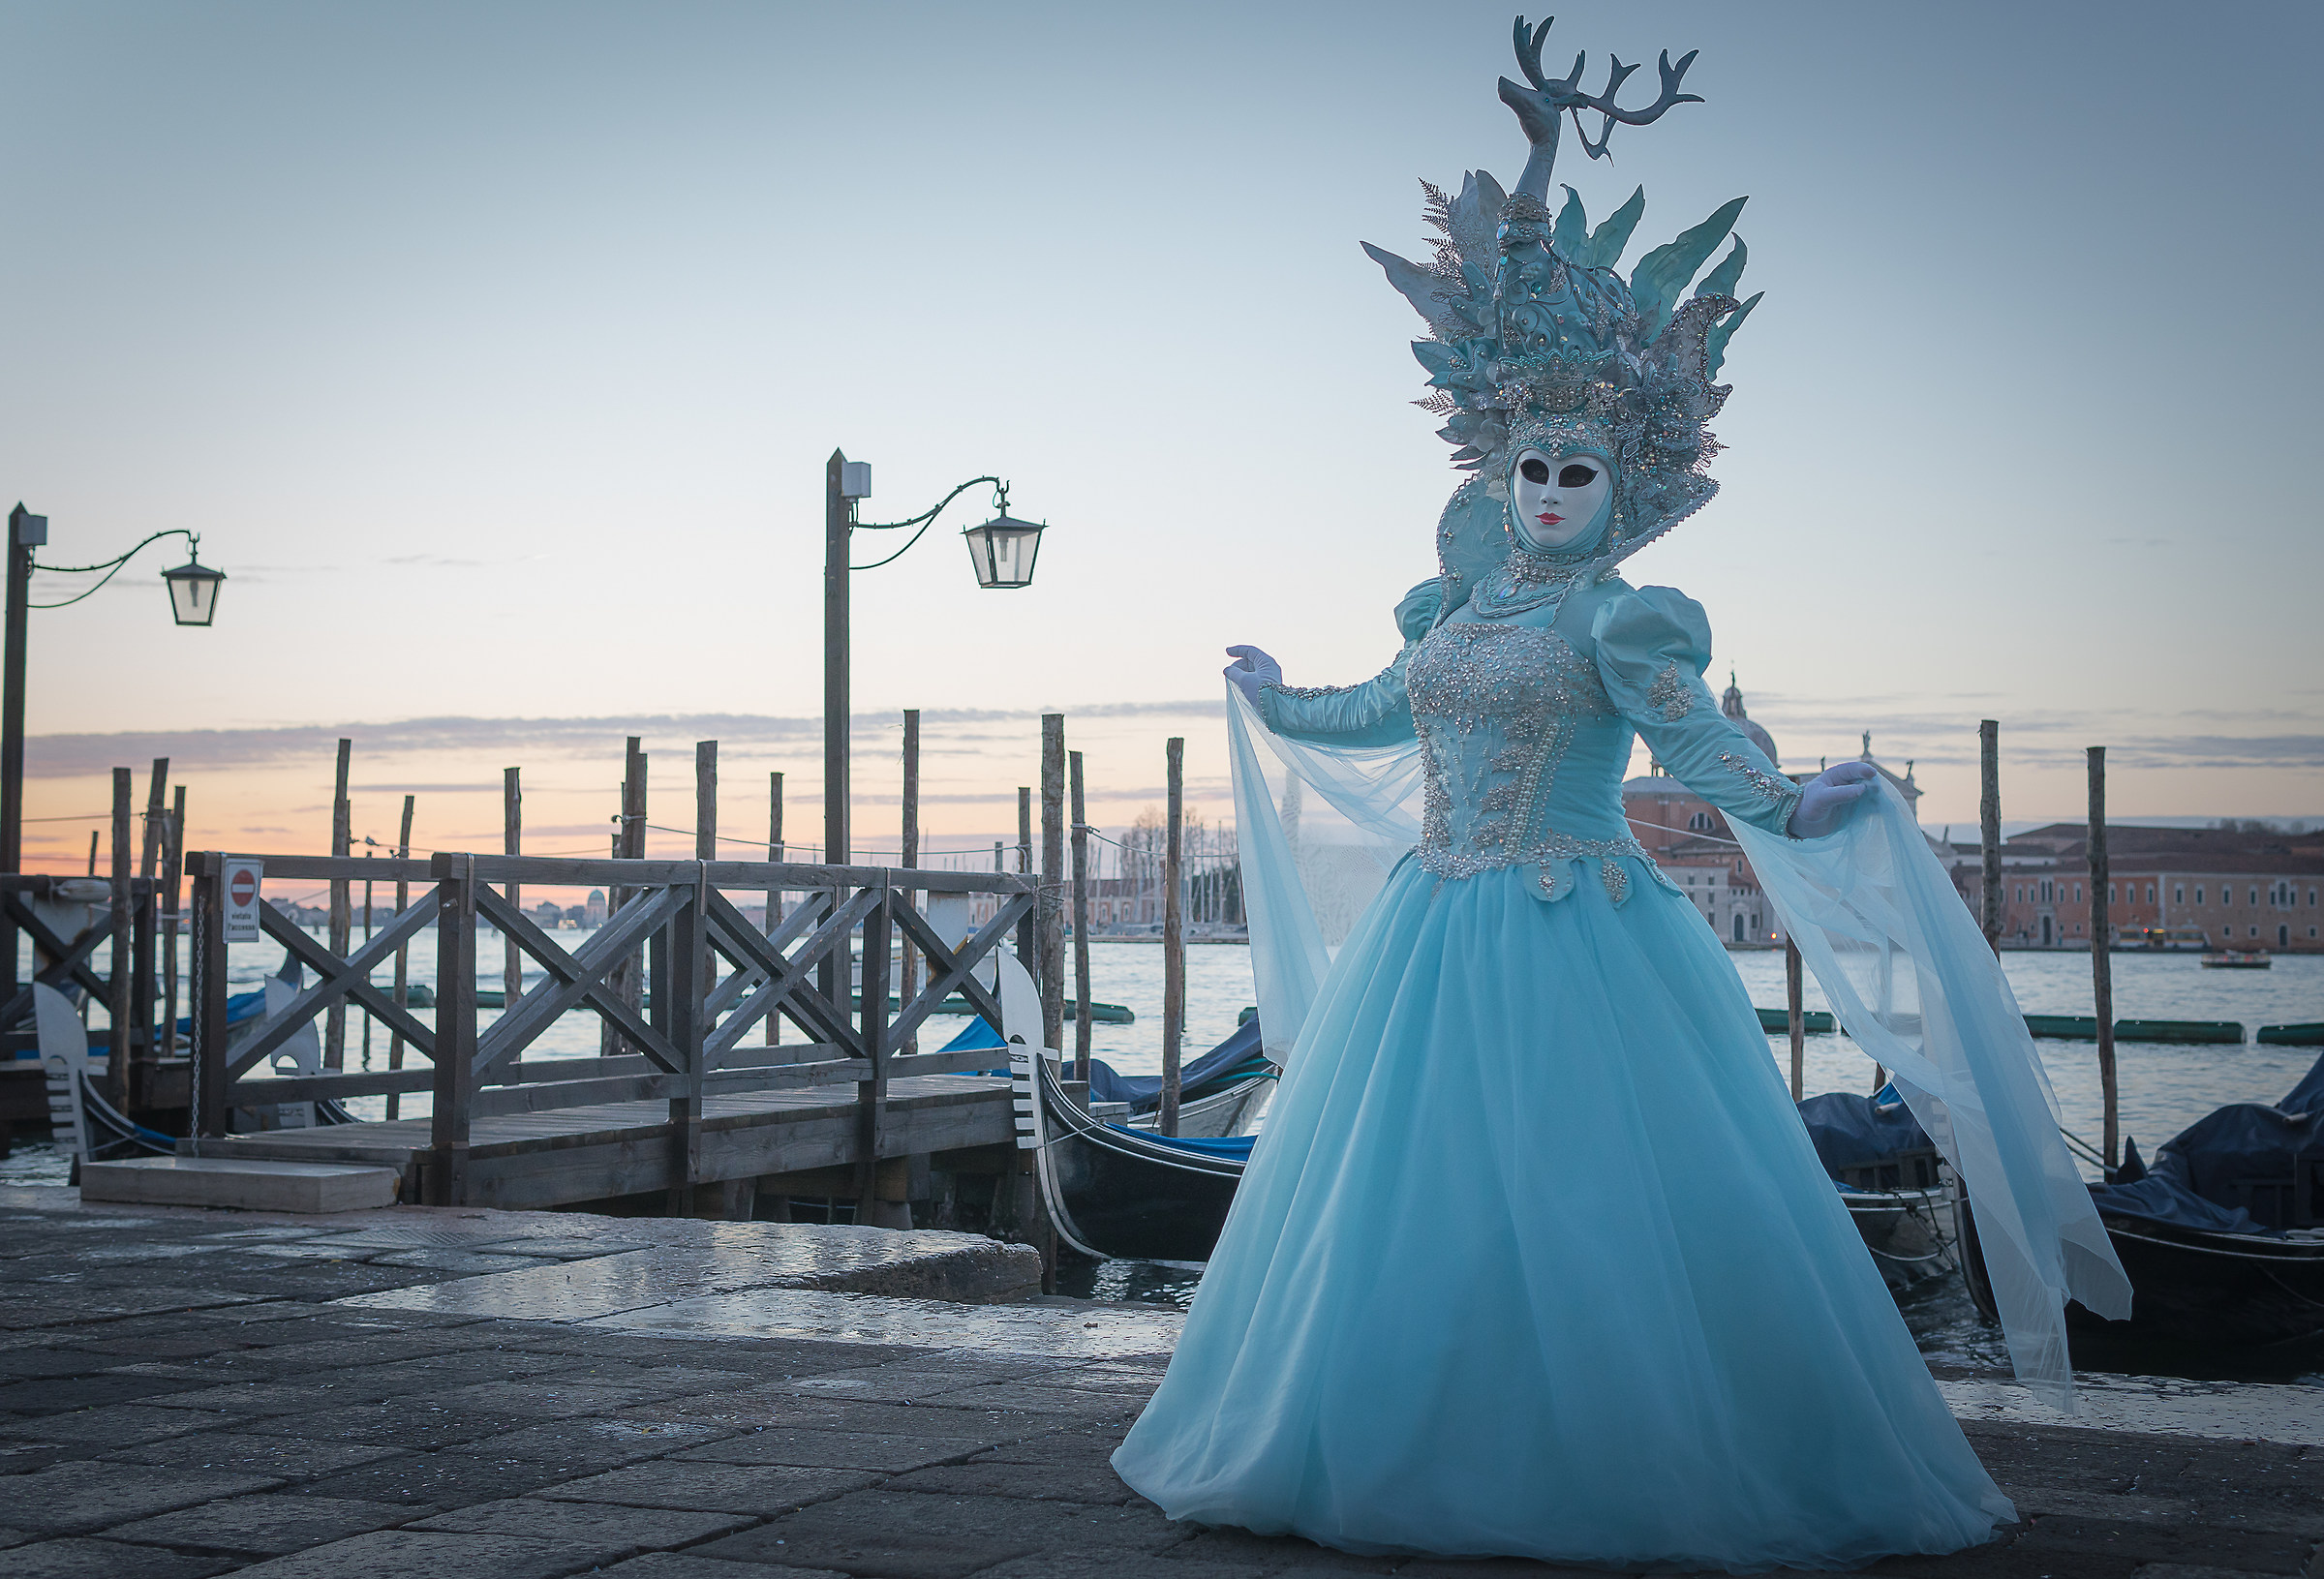 Venetian carnival 1...